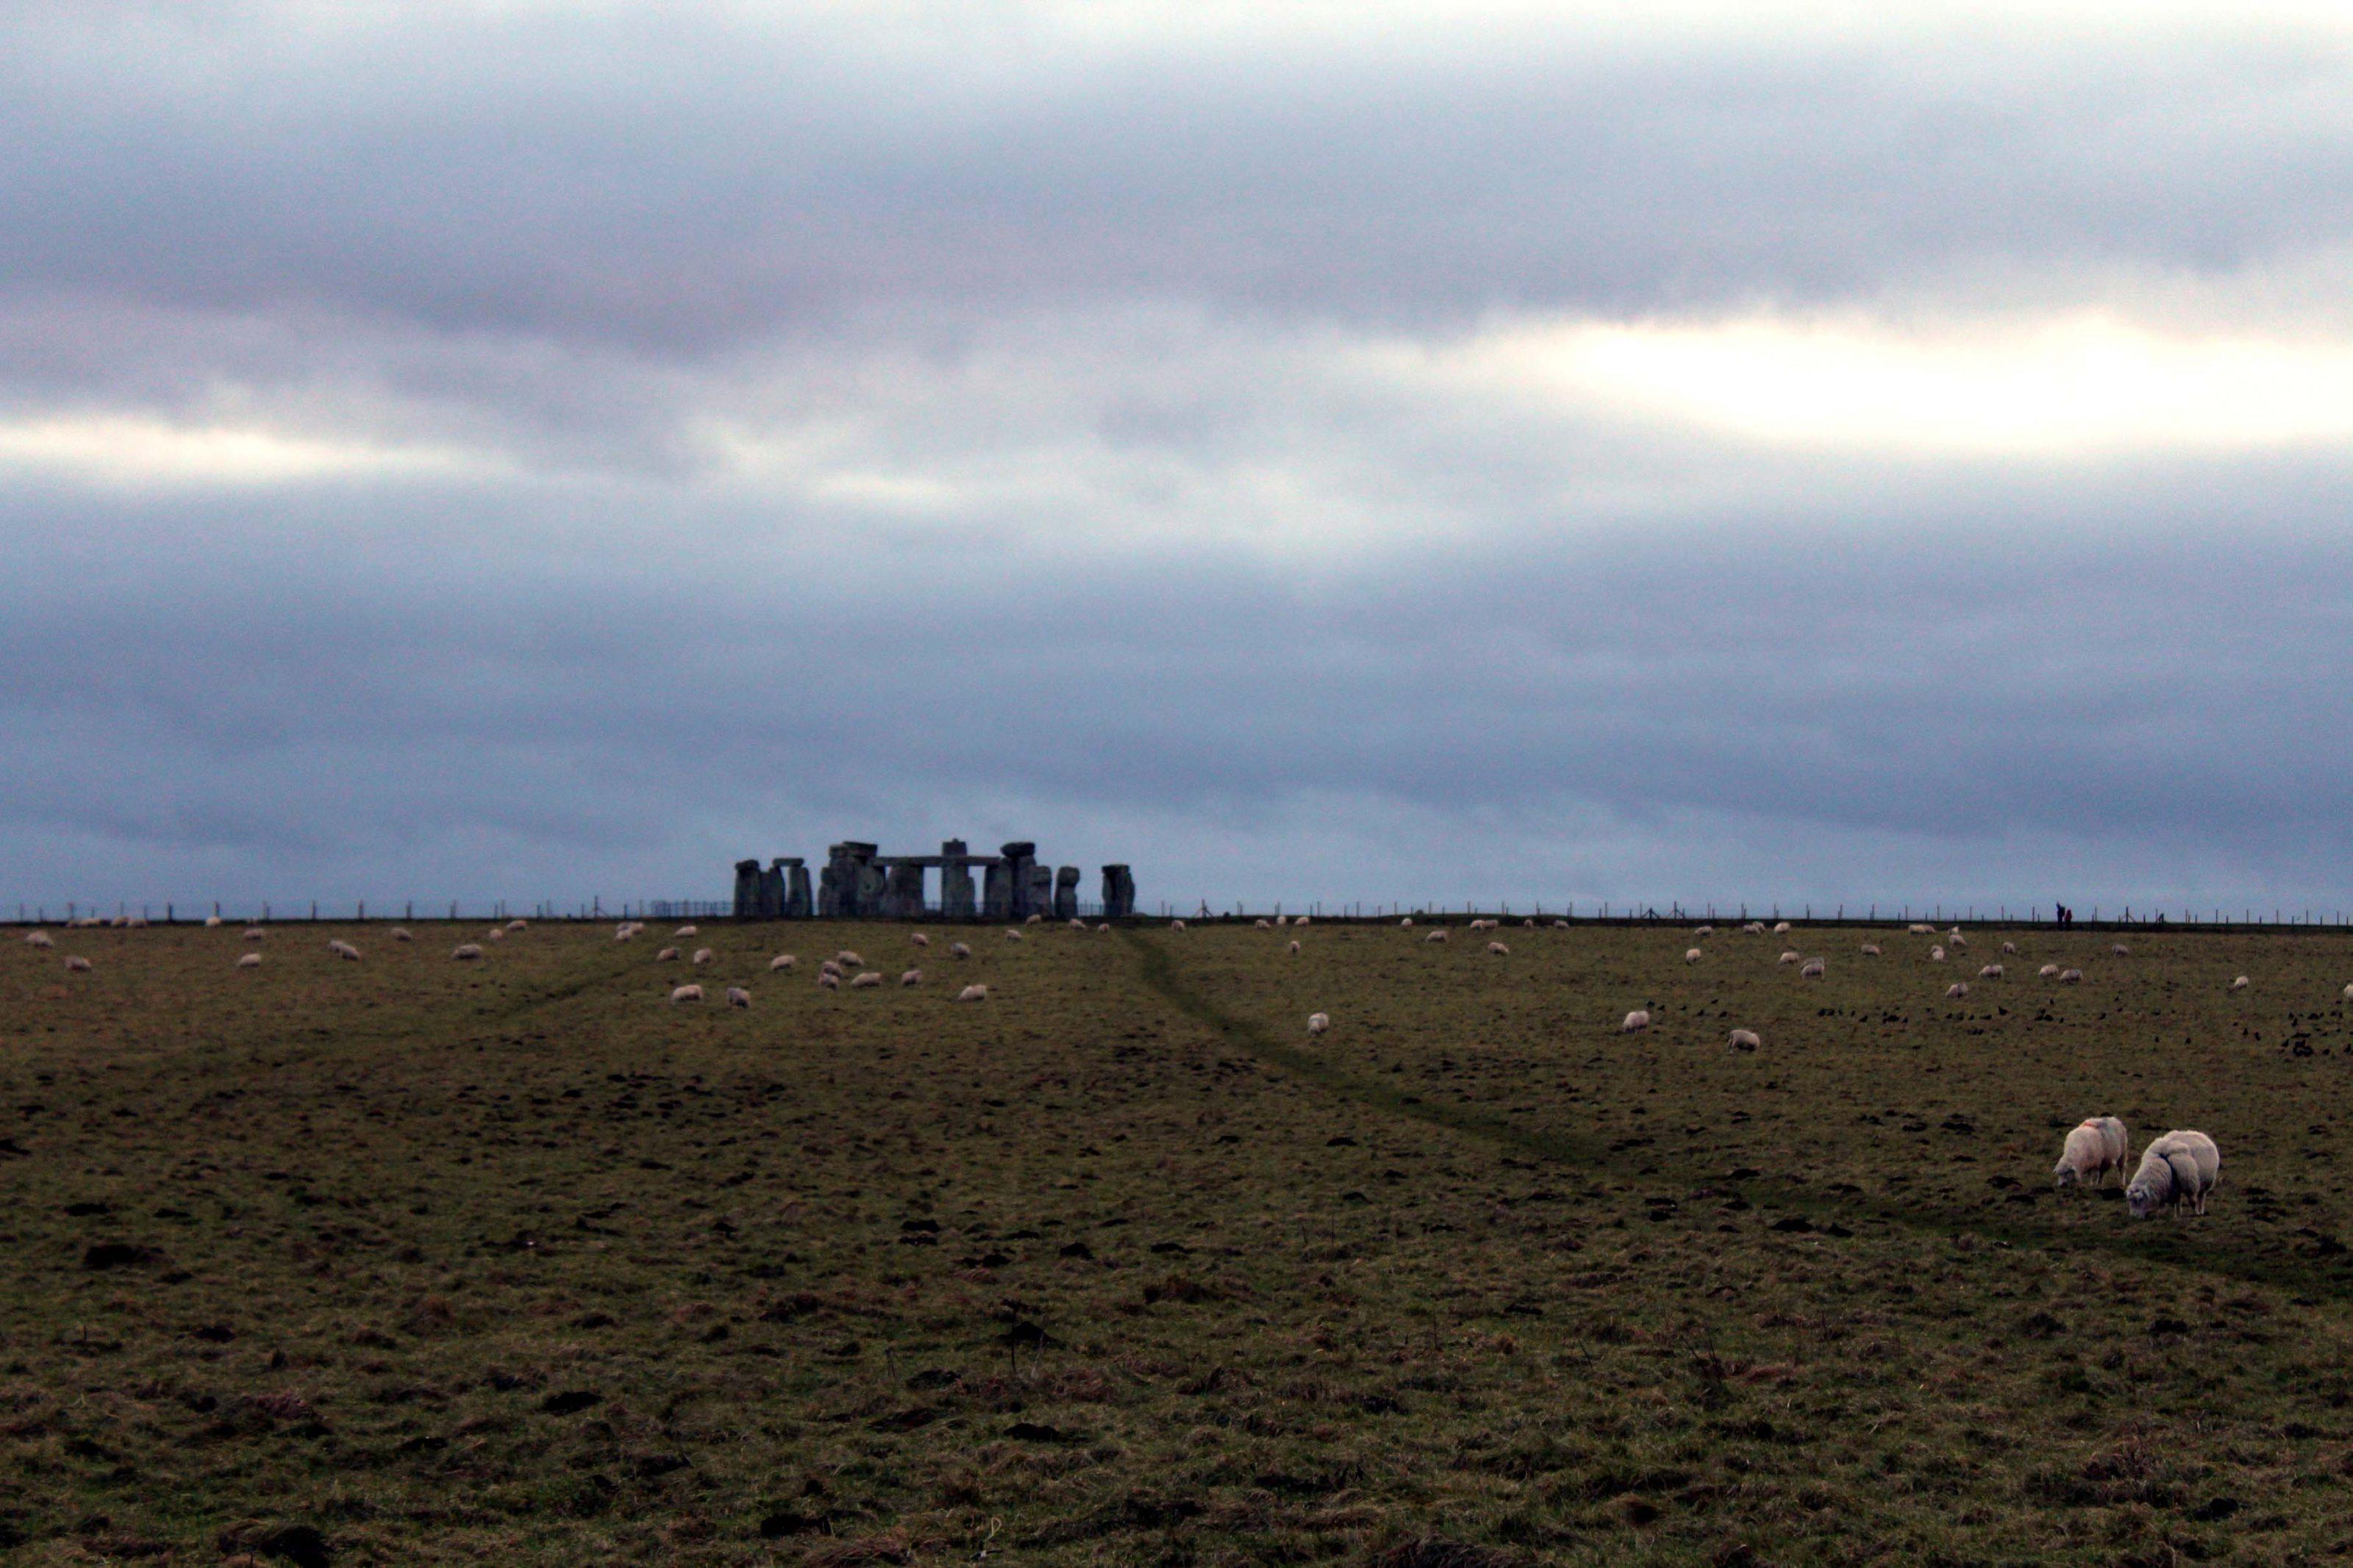 Great Stones Way long distance walking path - Stonehenge